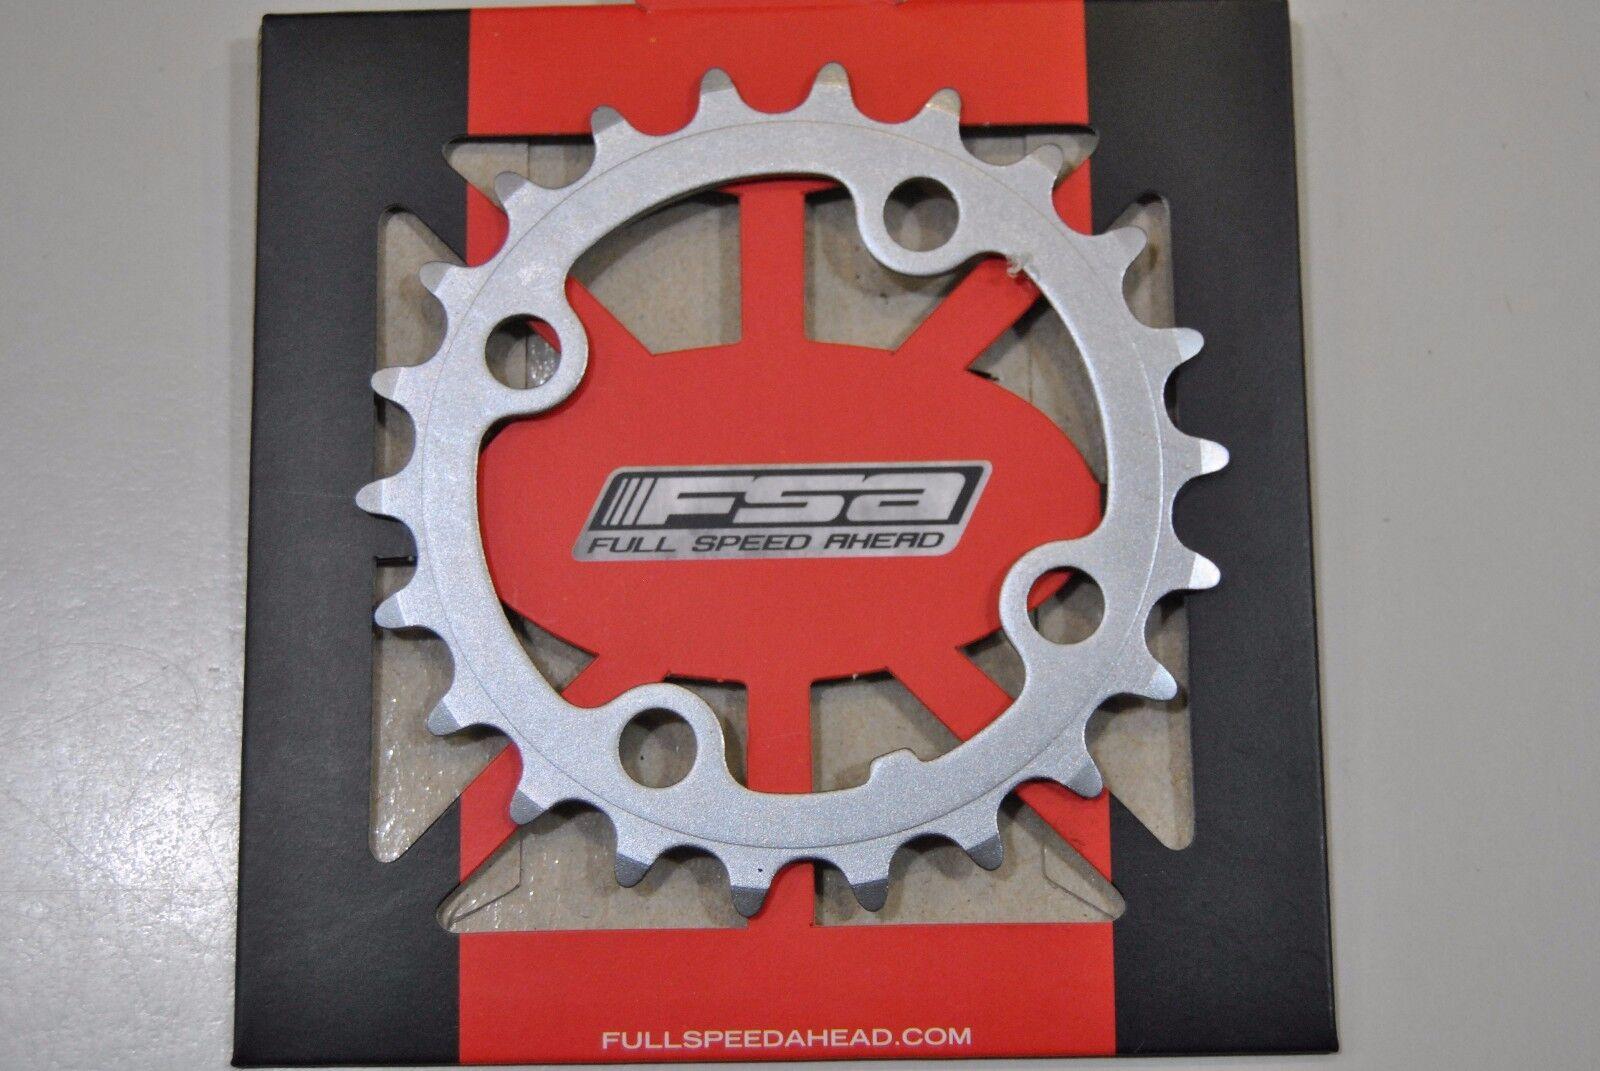 Corona FSA MTB MTB MTB 22T 9s 64mm Acciaio Silver/CHAINRING FSA 22T 64mm 9s STEEL SILVER 0407b1